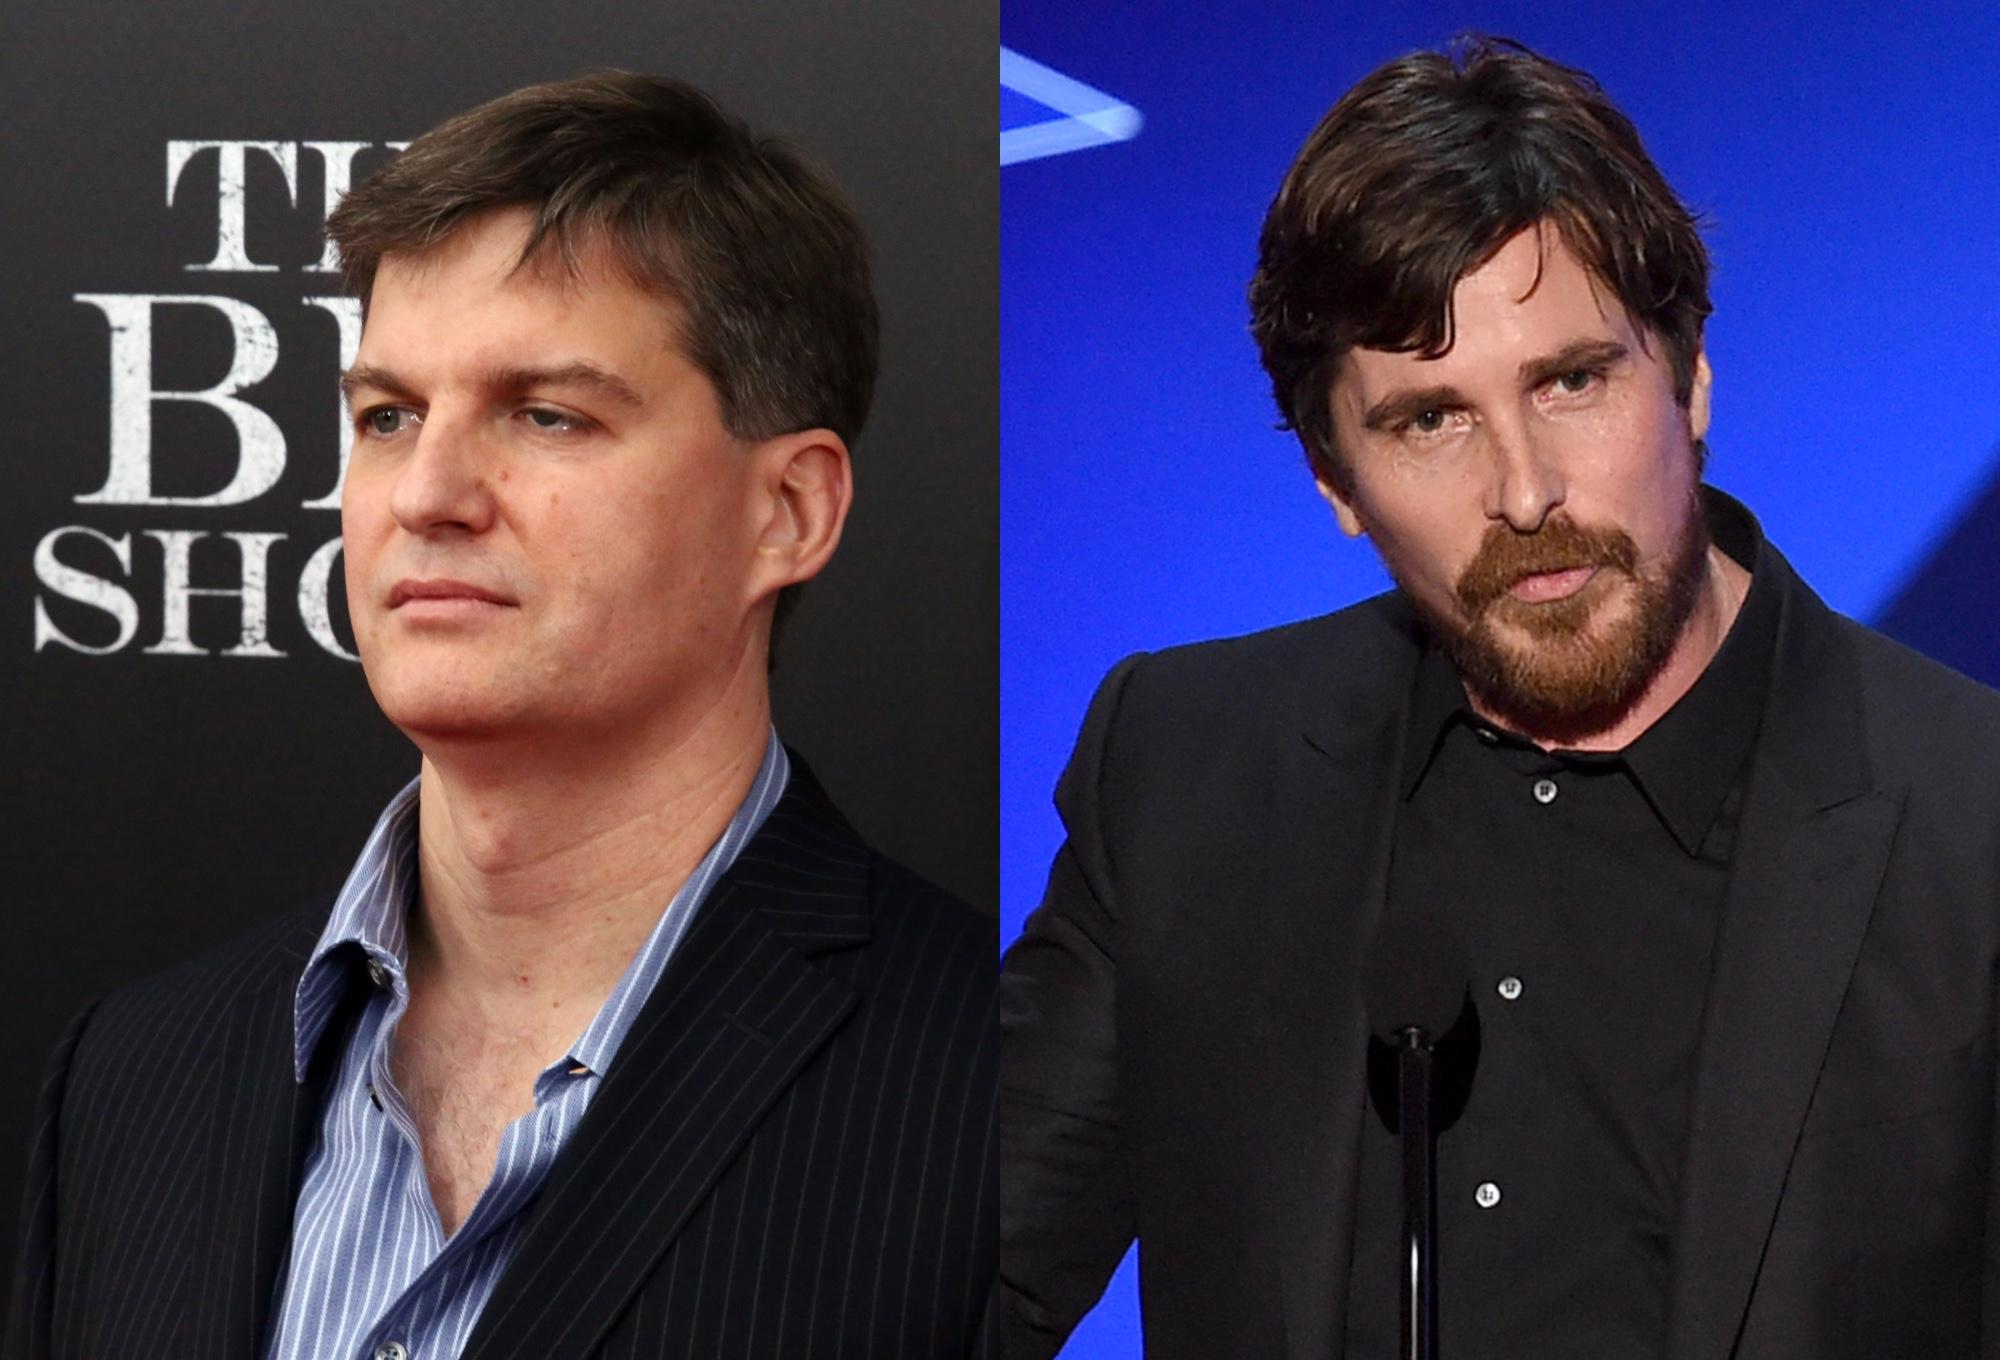 Michael Burry Christian Bale grande scommessa